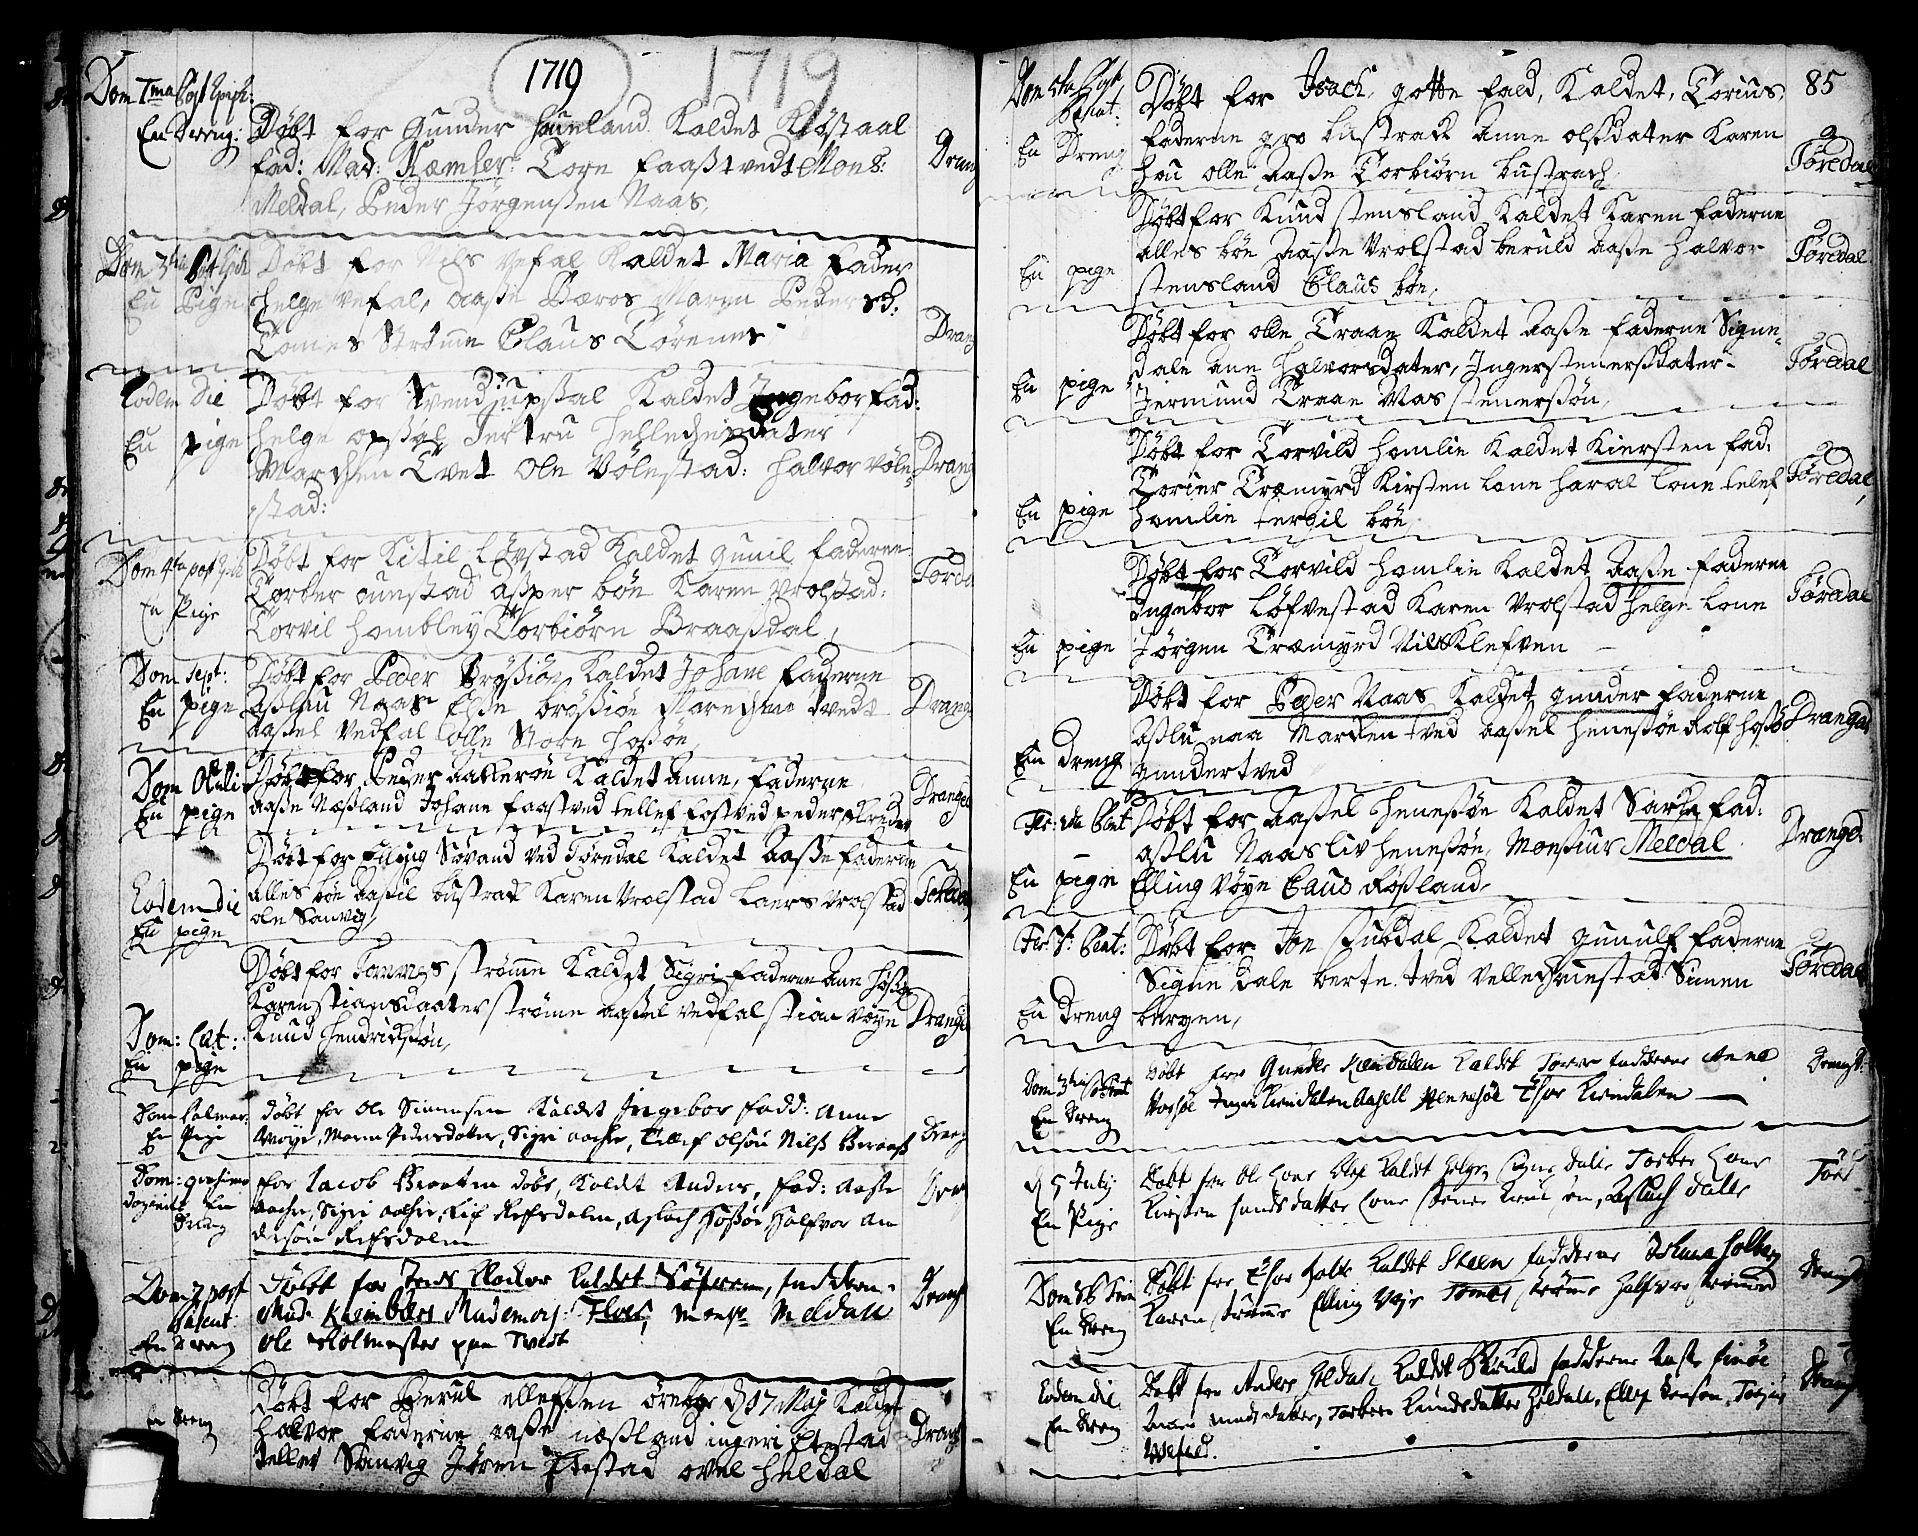 SAKO, Drangedal kirkebøker, F/Fa/L0001: Ministerialbok nr. 1, 1697-1767, s. 85